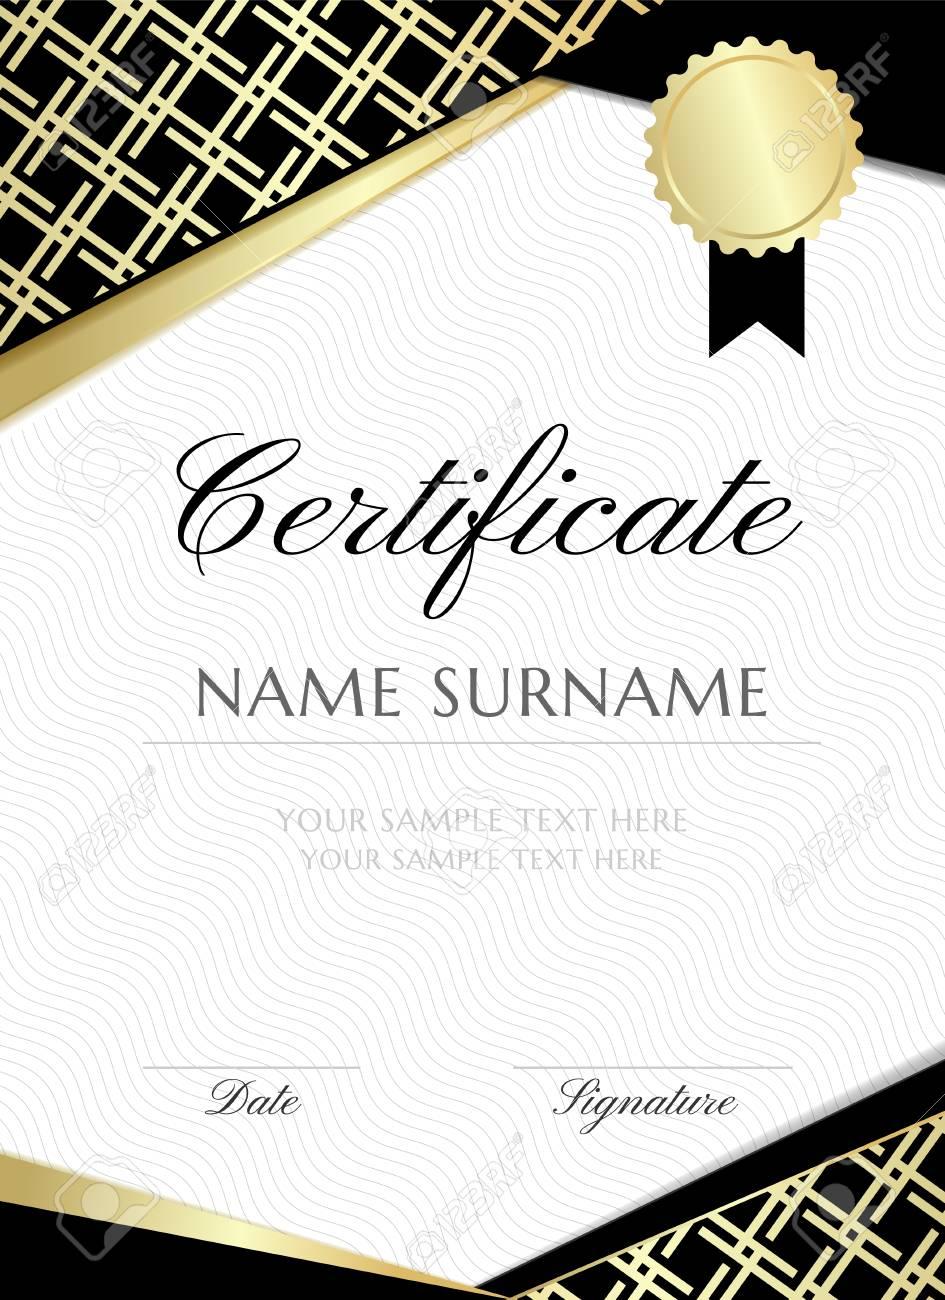 Gold Gride Certificate Design Template Graduation Vertical - Graduation banner template